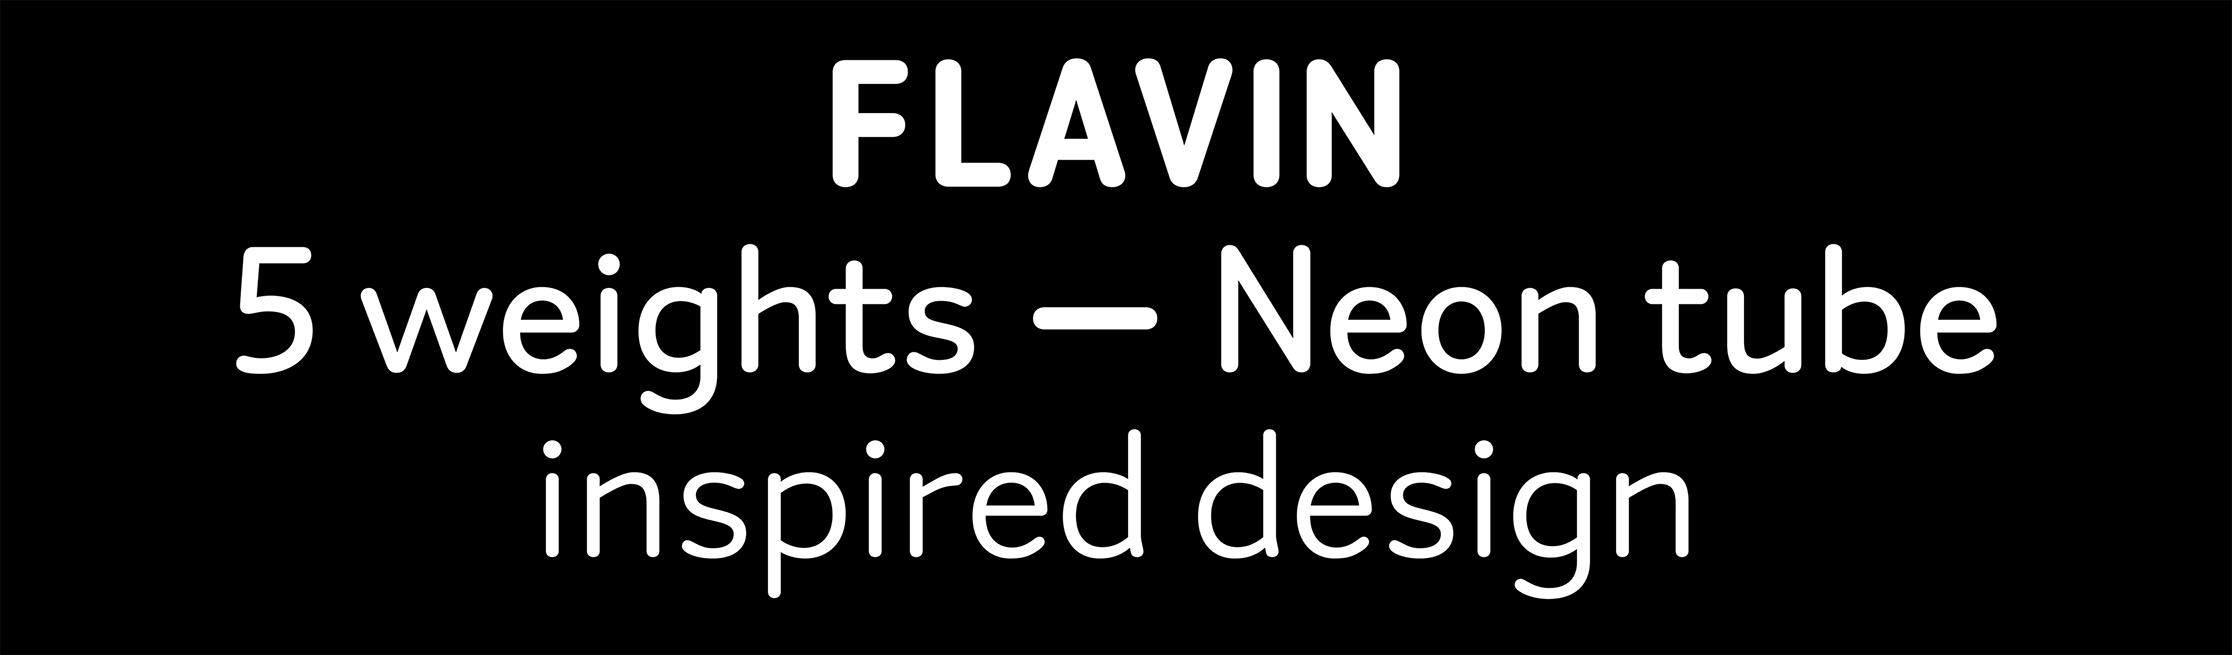 Flavin sample